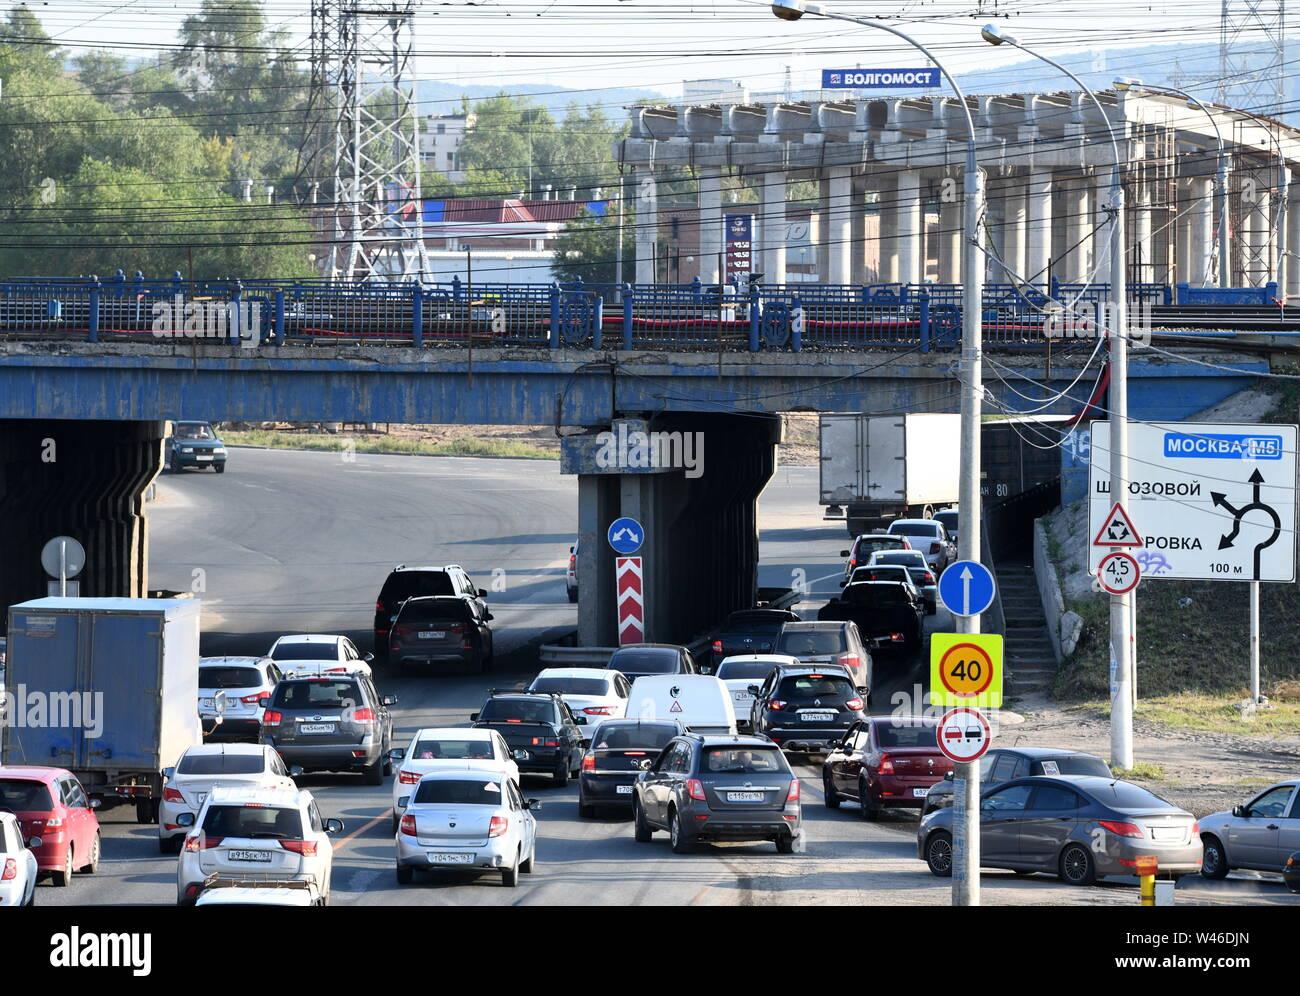 Under M5 Motorway Stock Photos & Under M5 Motorway Stock Images - Alamy